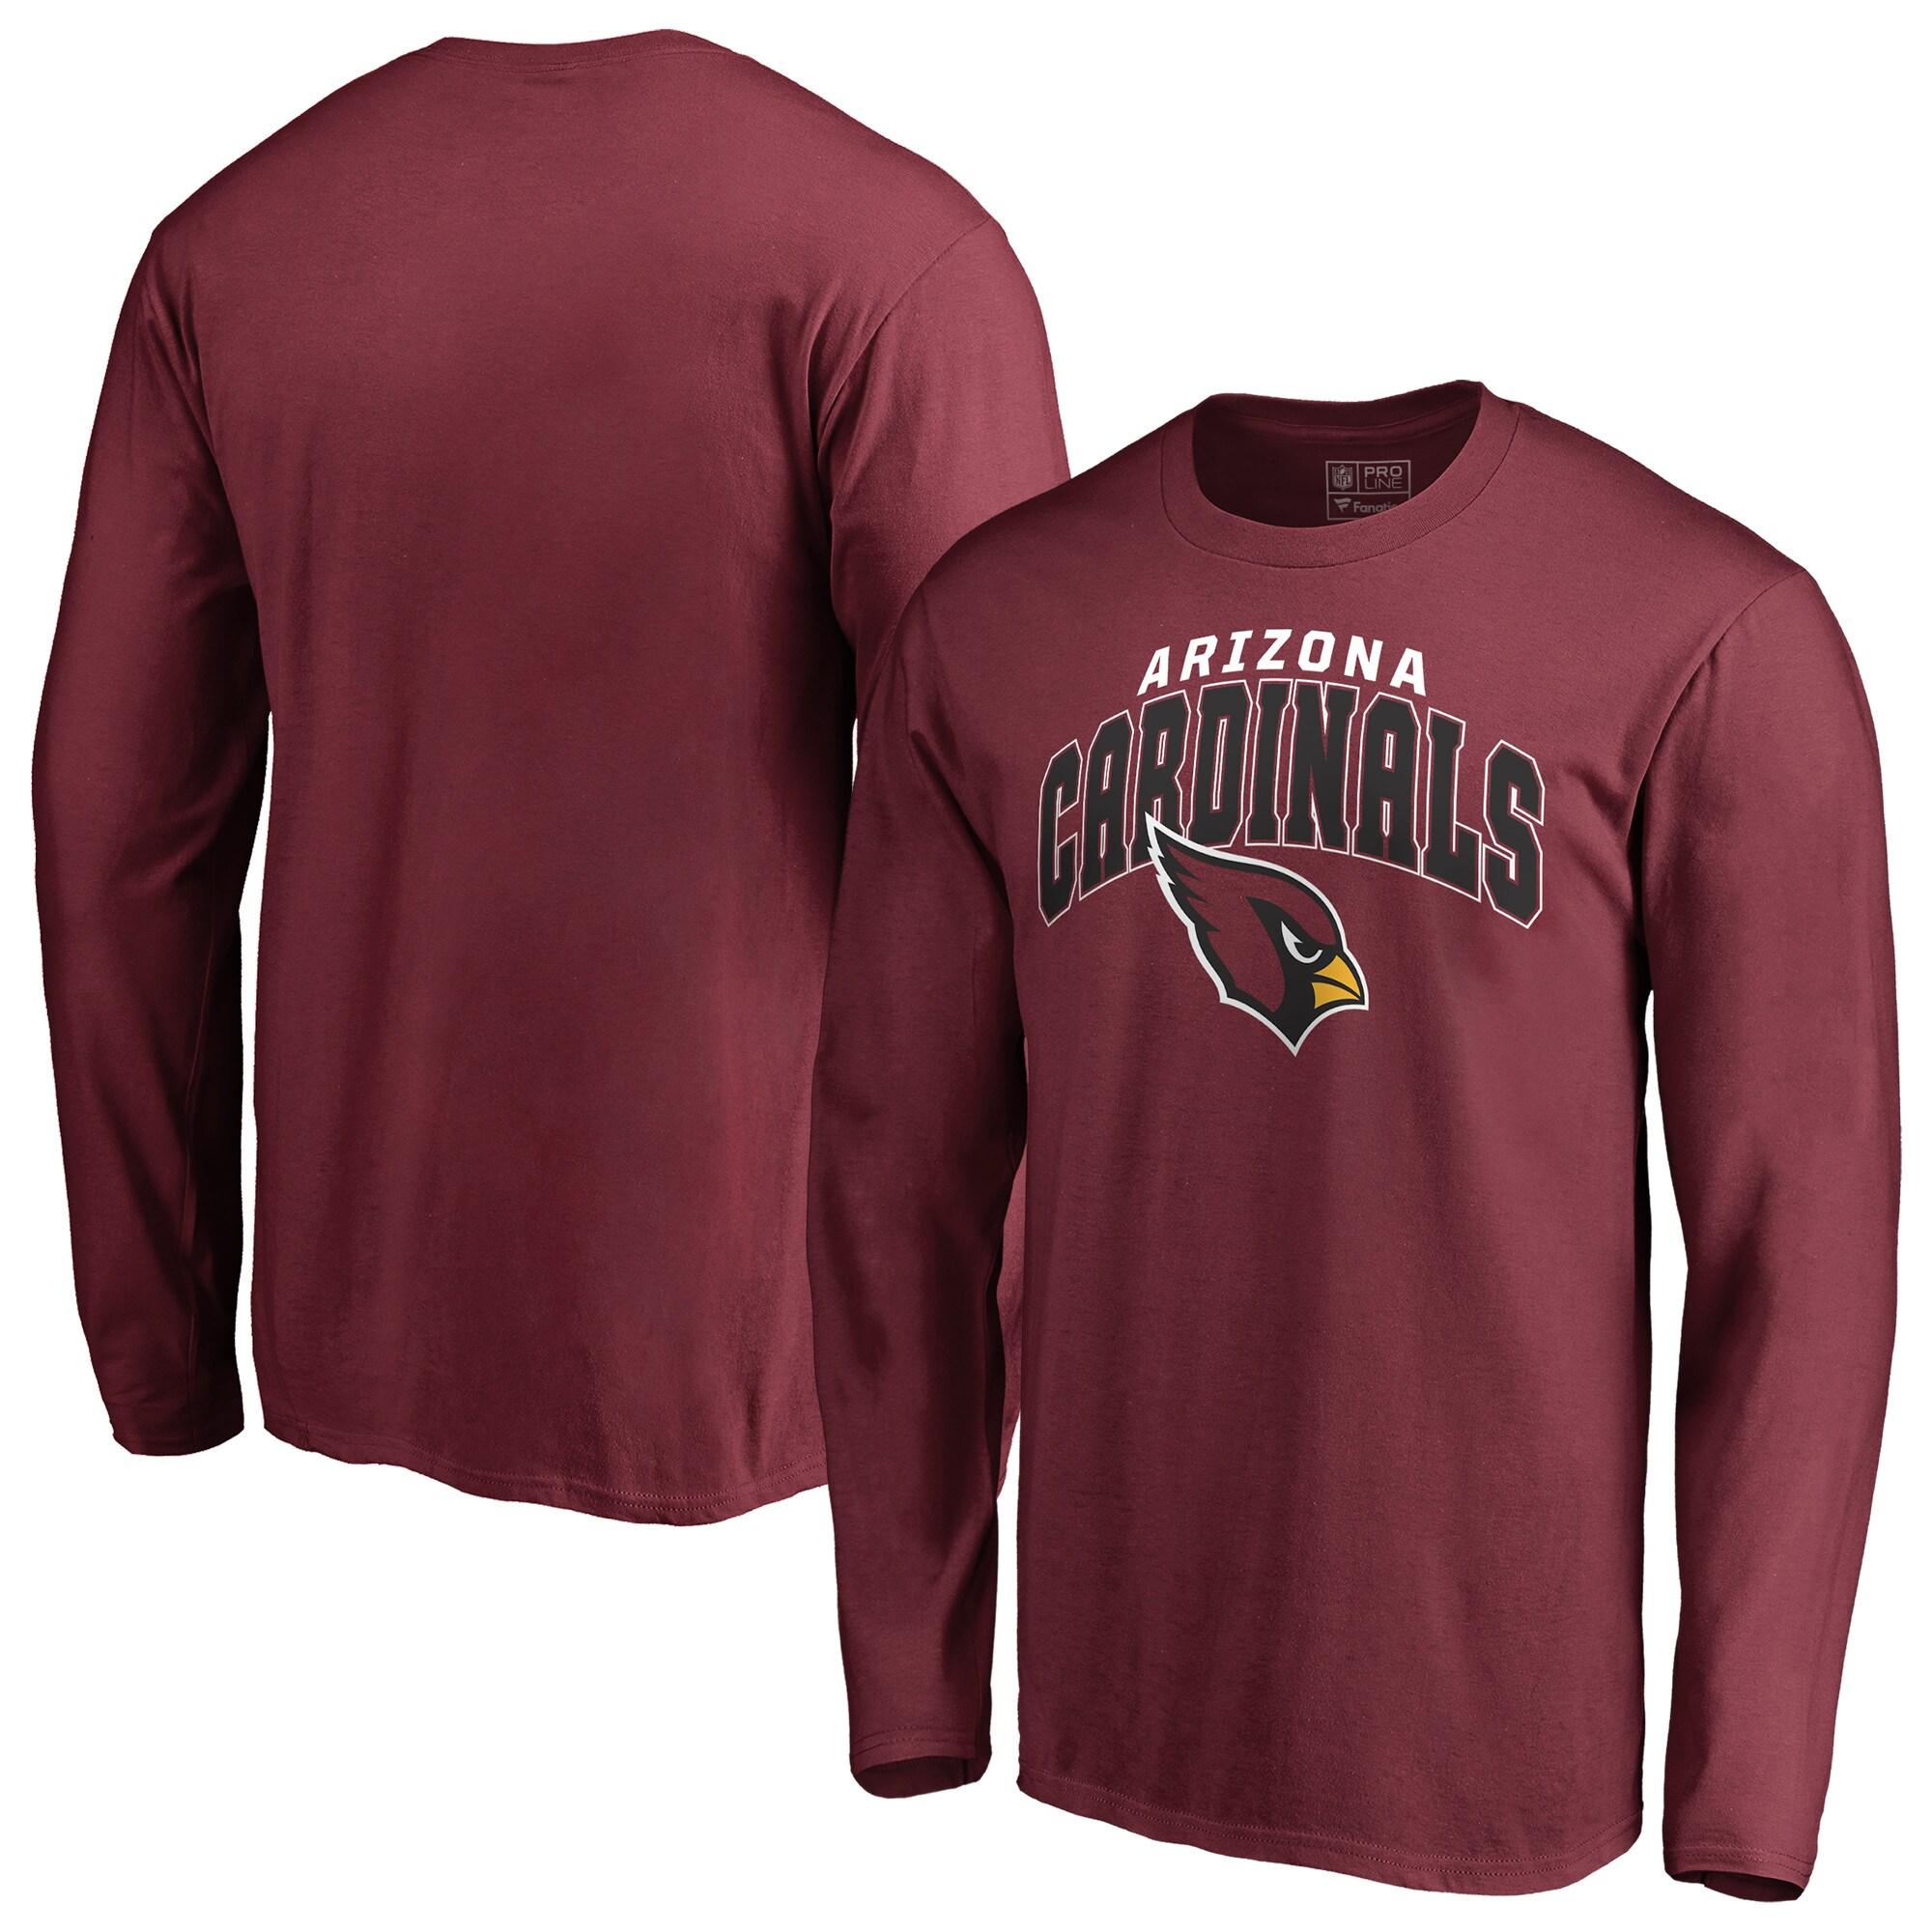 Arizona Cardinals NFL Pro Line by Fanatics Branded Big & Tall Steady Long Sleeve T-Shirt - Cardinal